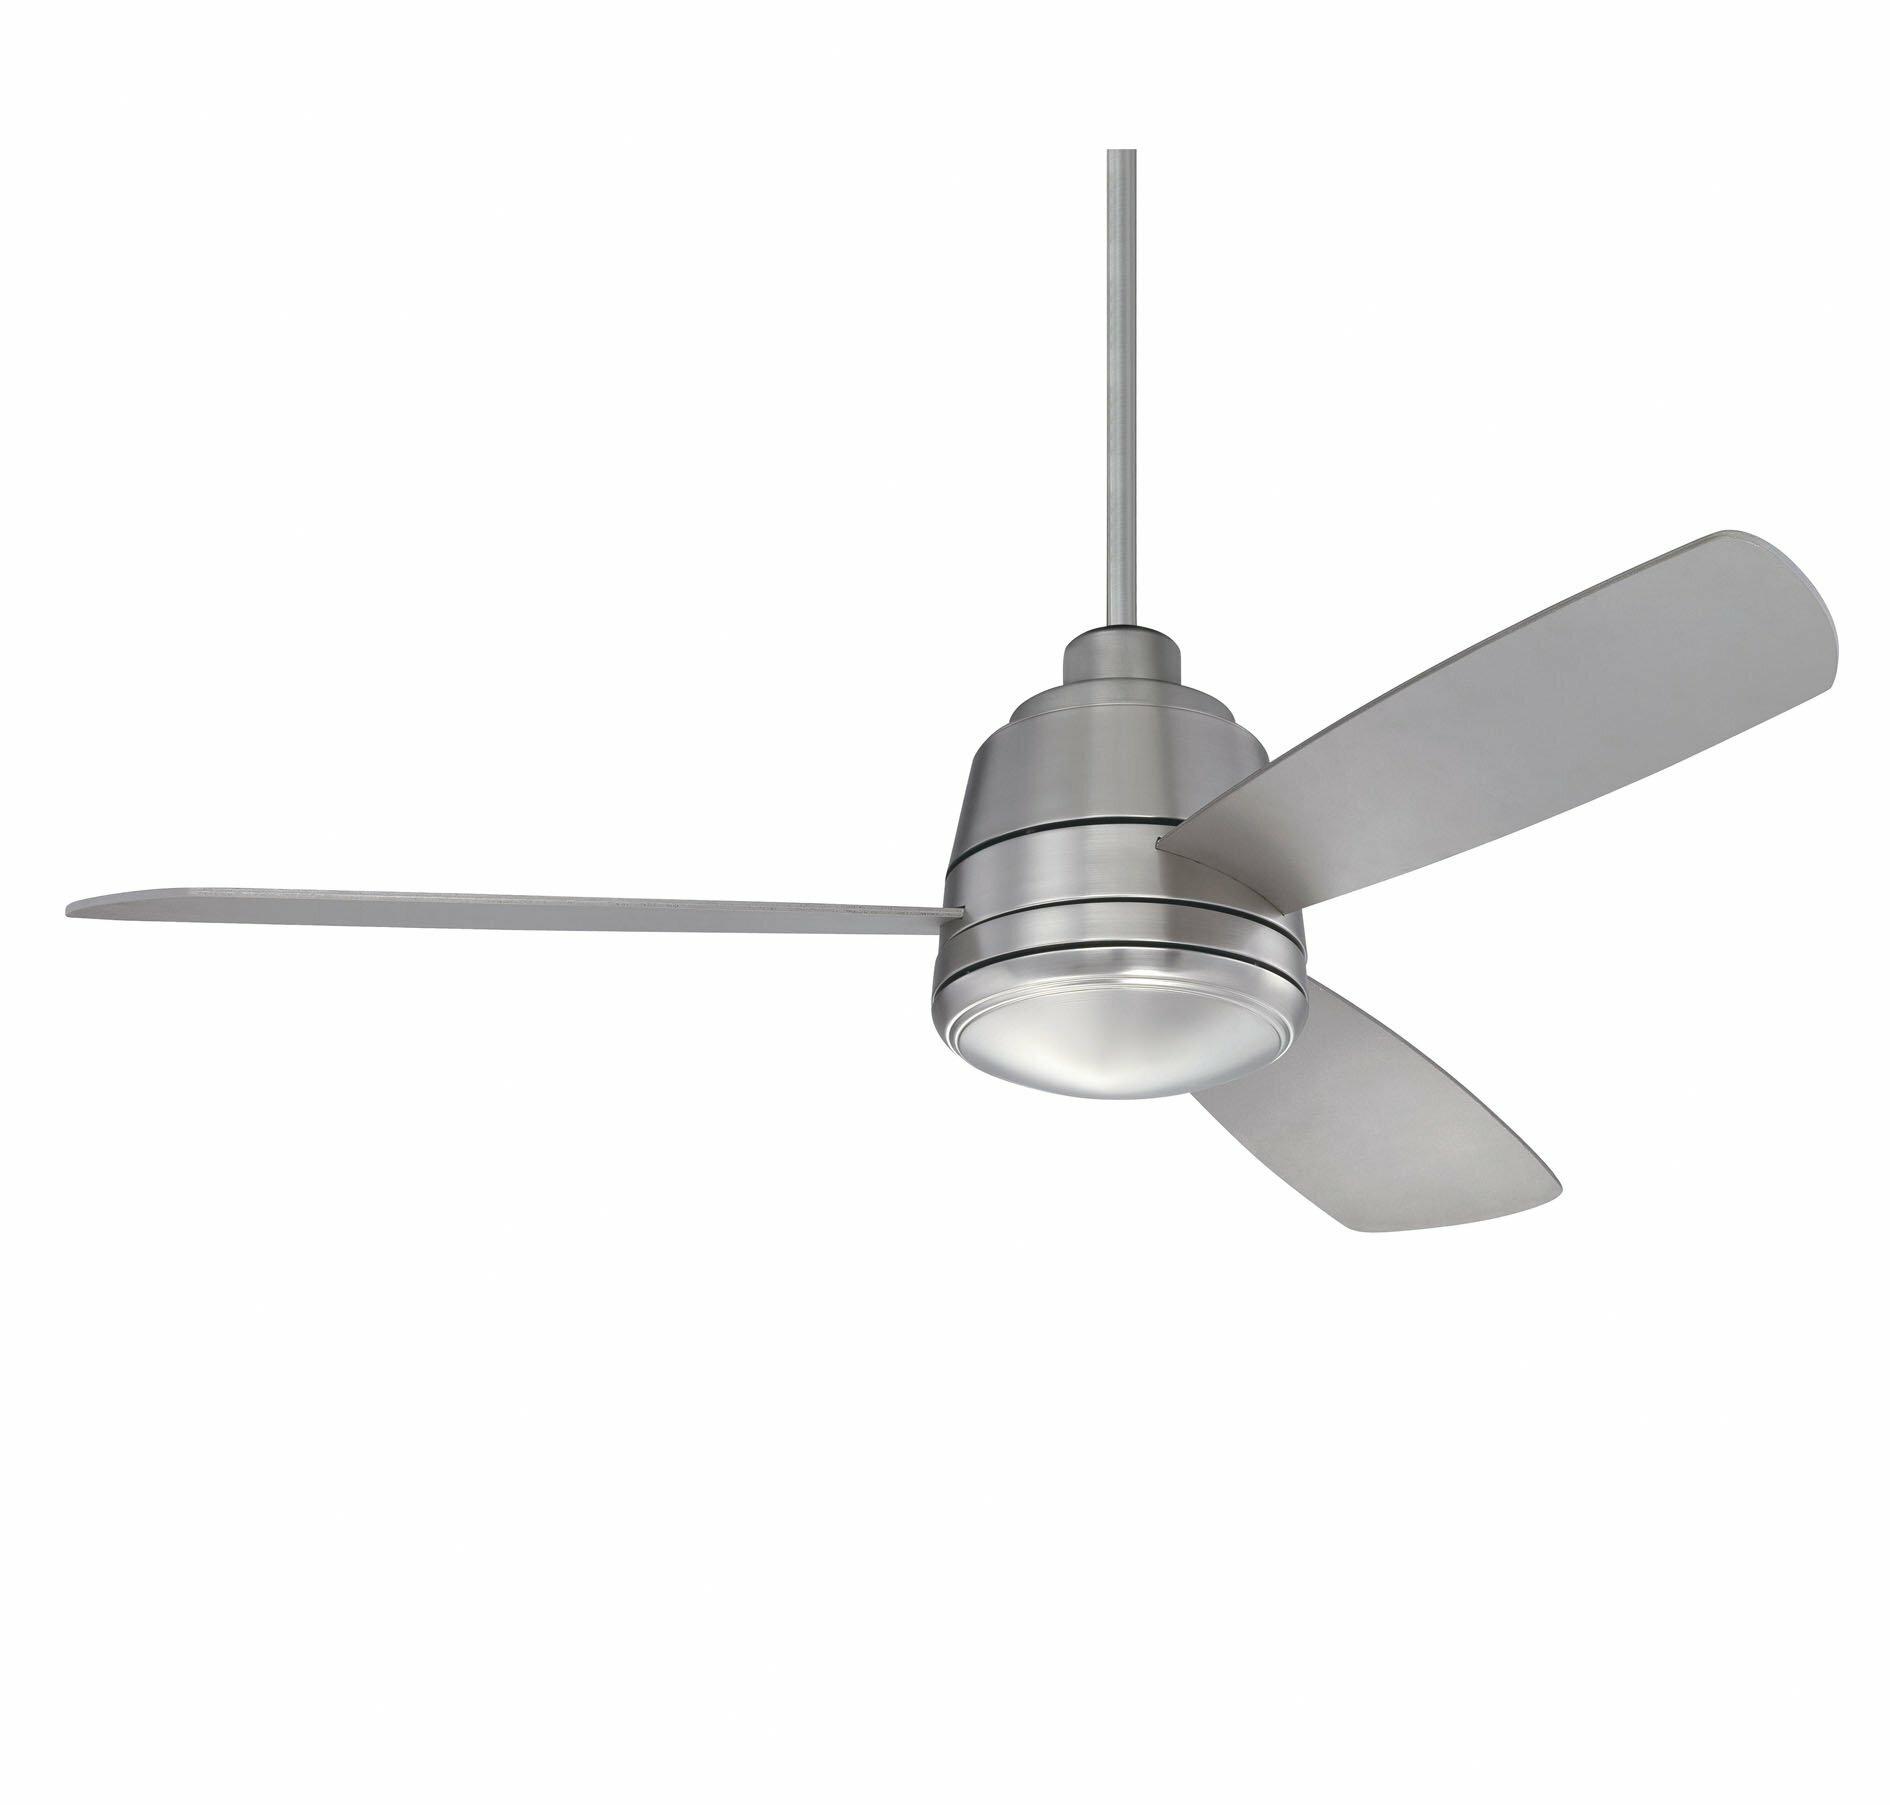 fan smsender three ceilings tulum co ceiling blade